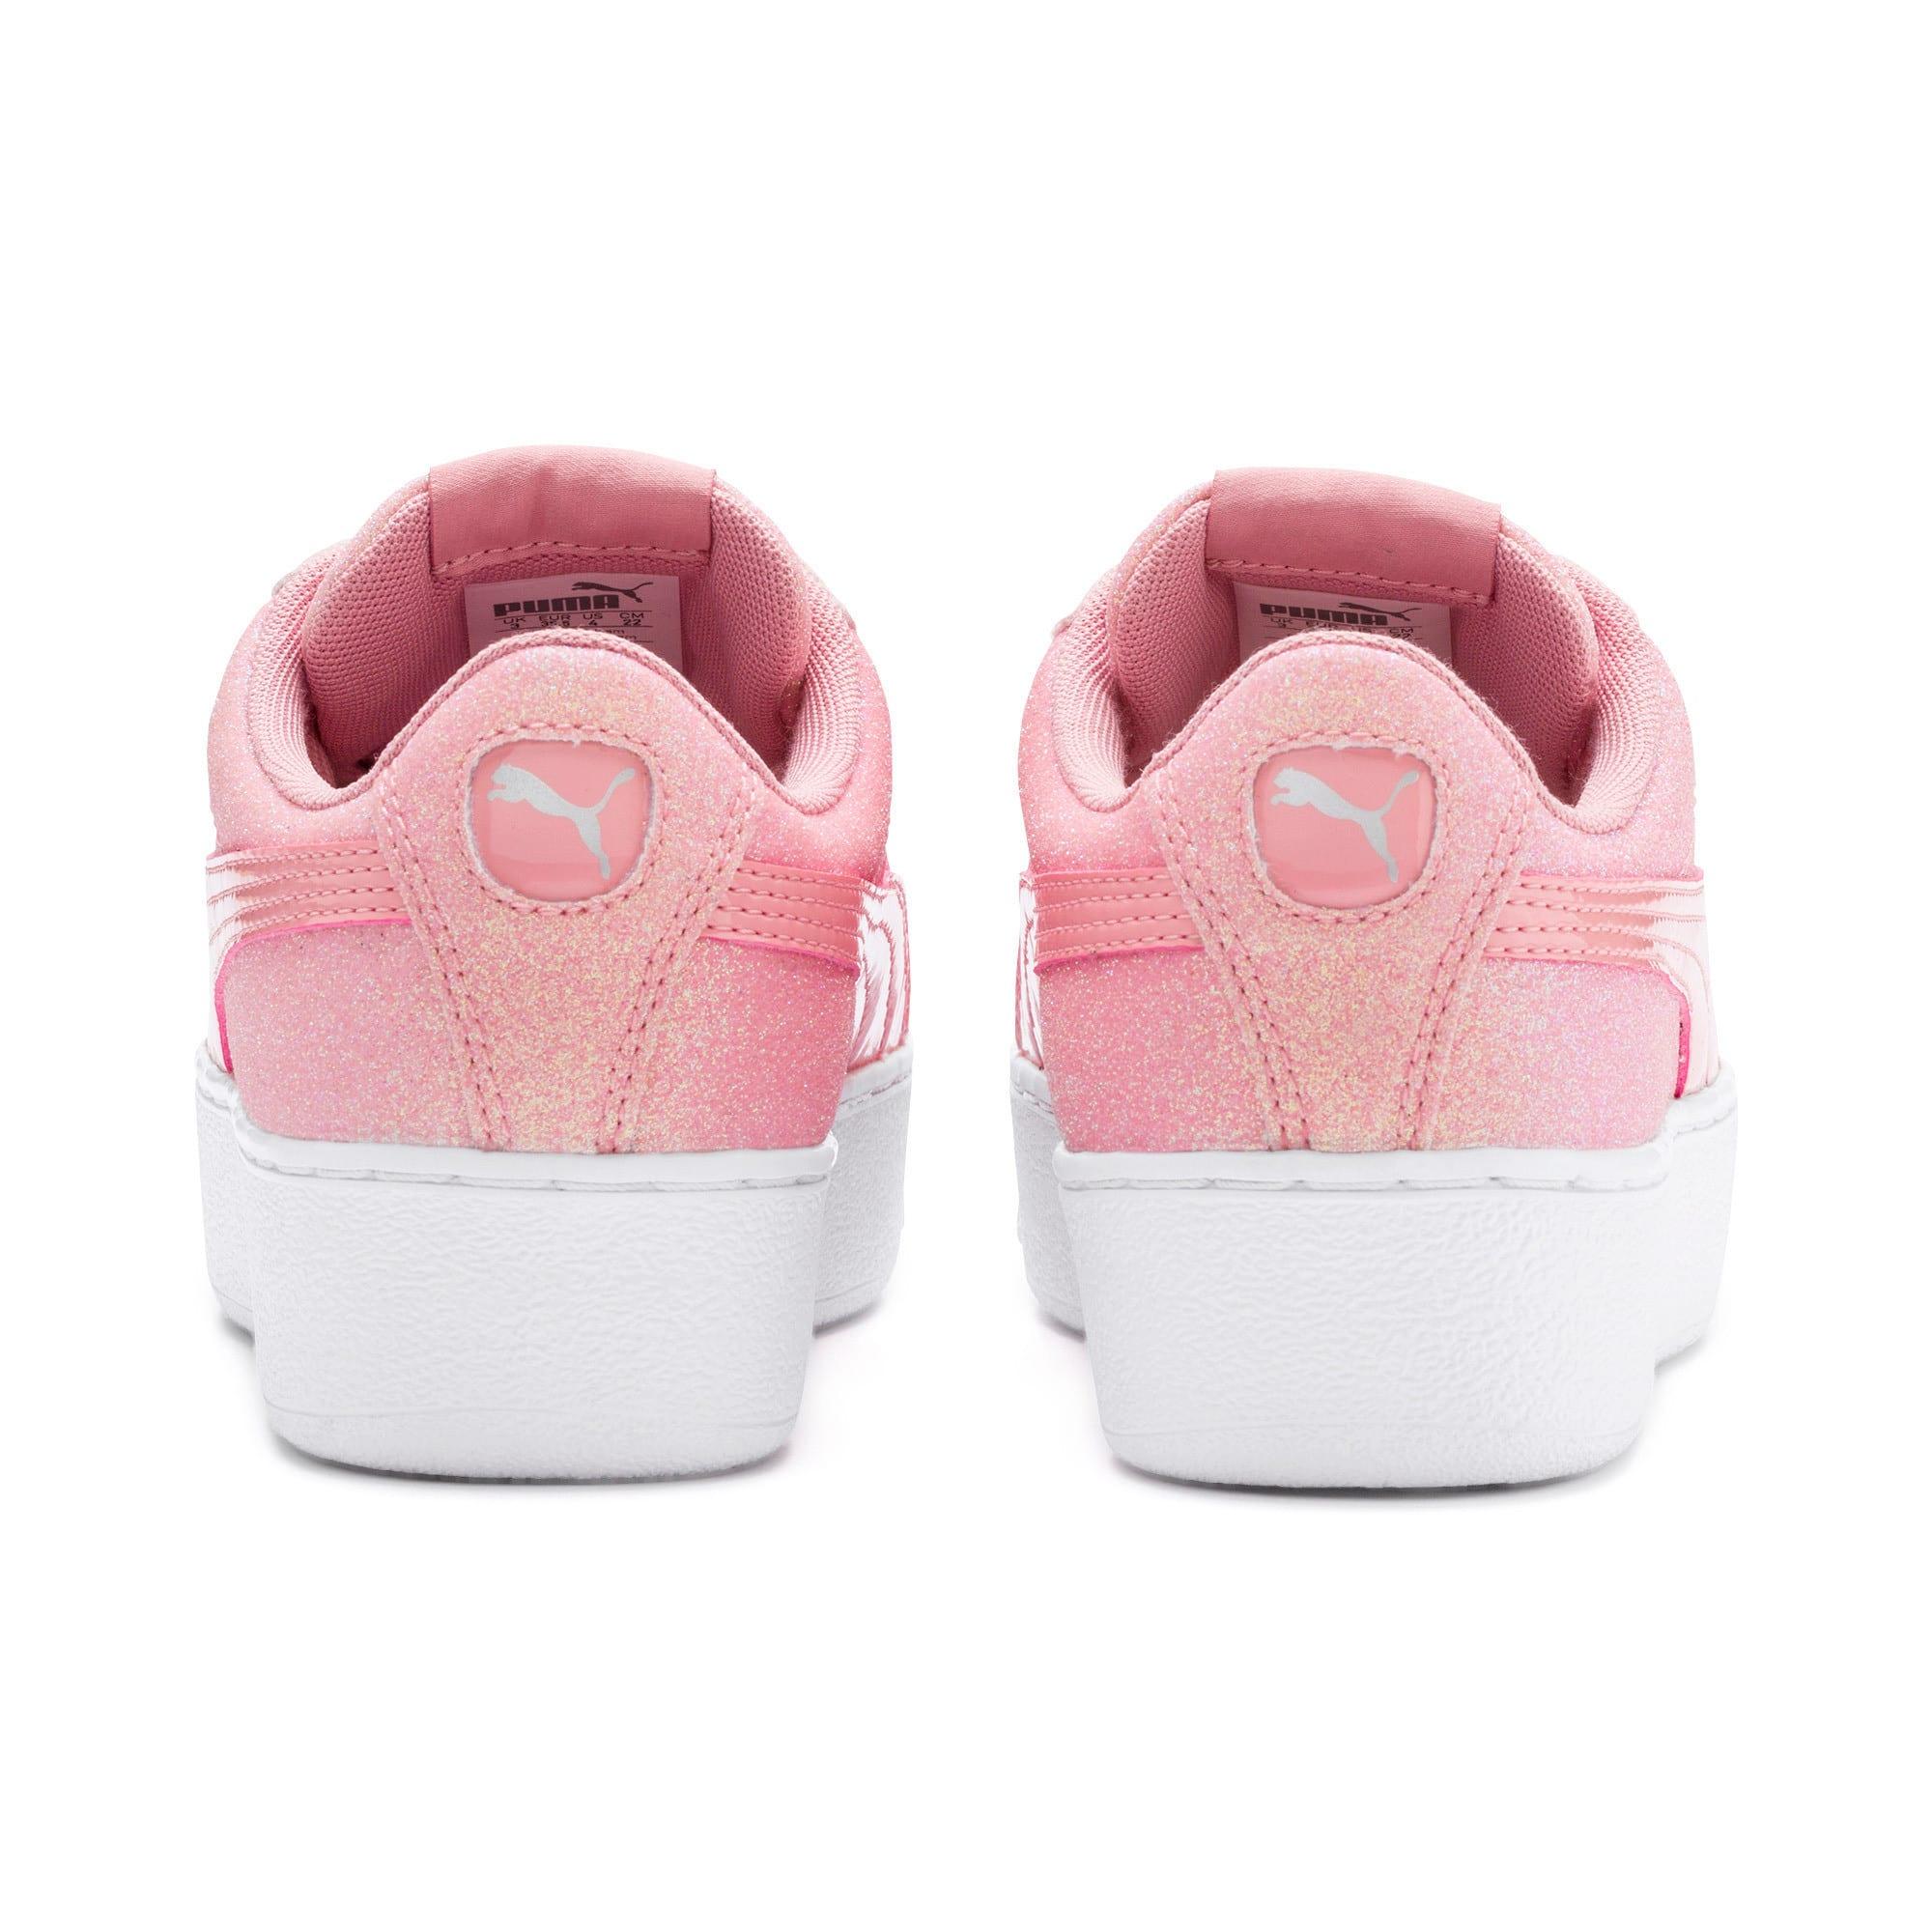 Thumbnail 3 of PUMA Vikky Platform Glitz Sneakers JR, Bridal Rose-Bridal Rose, medium